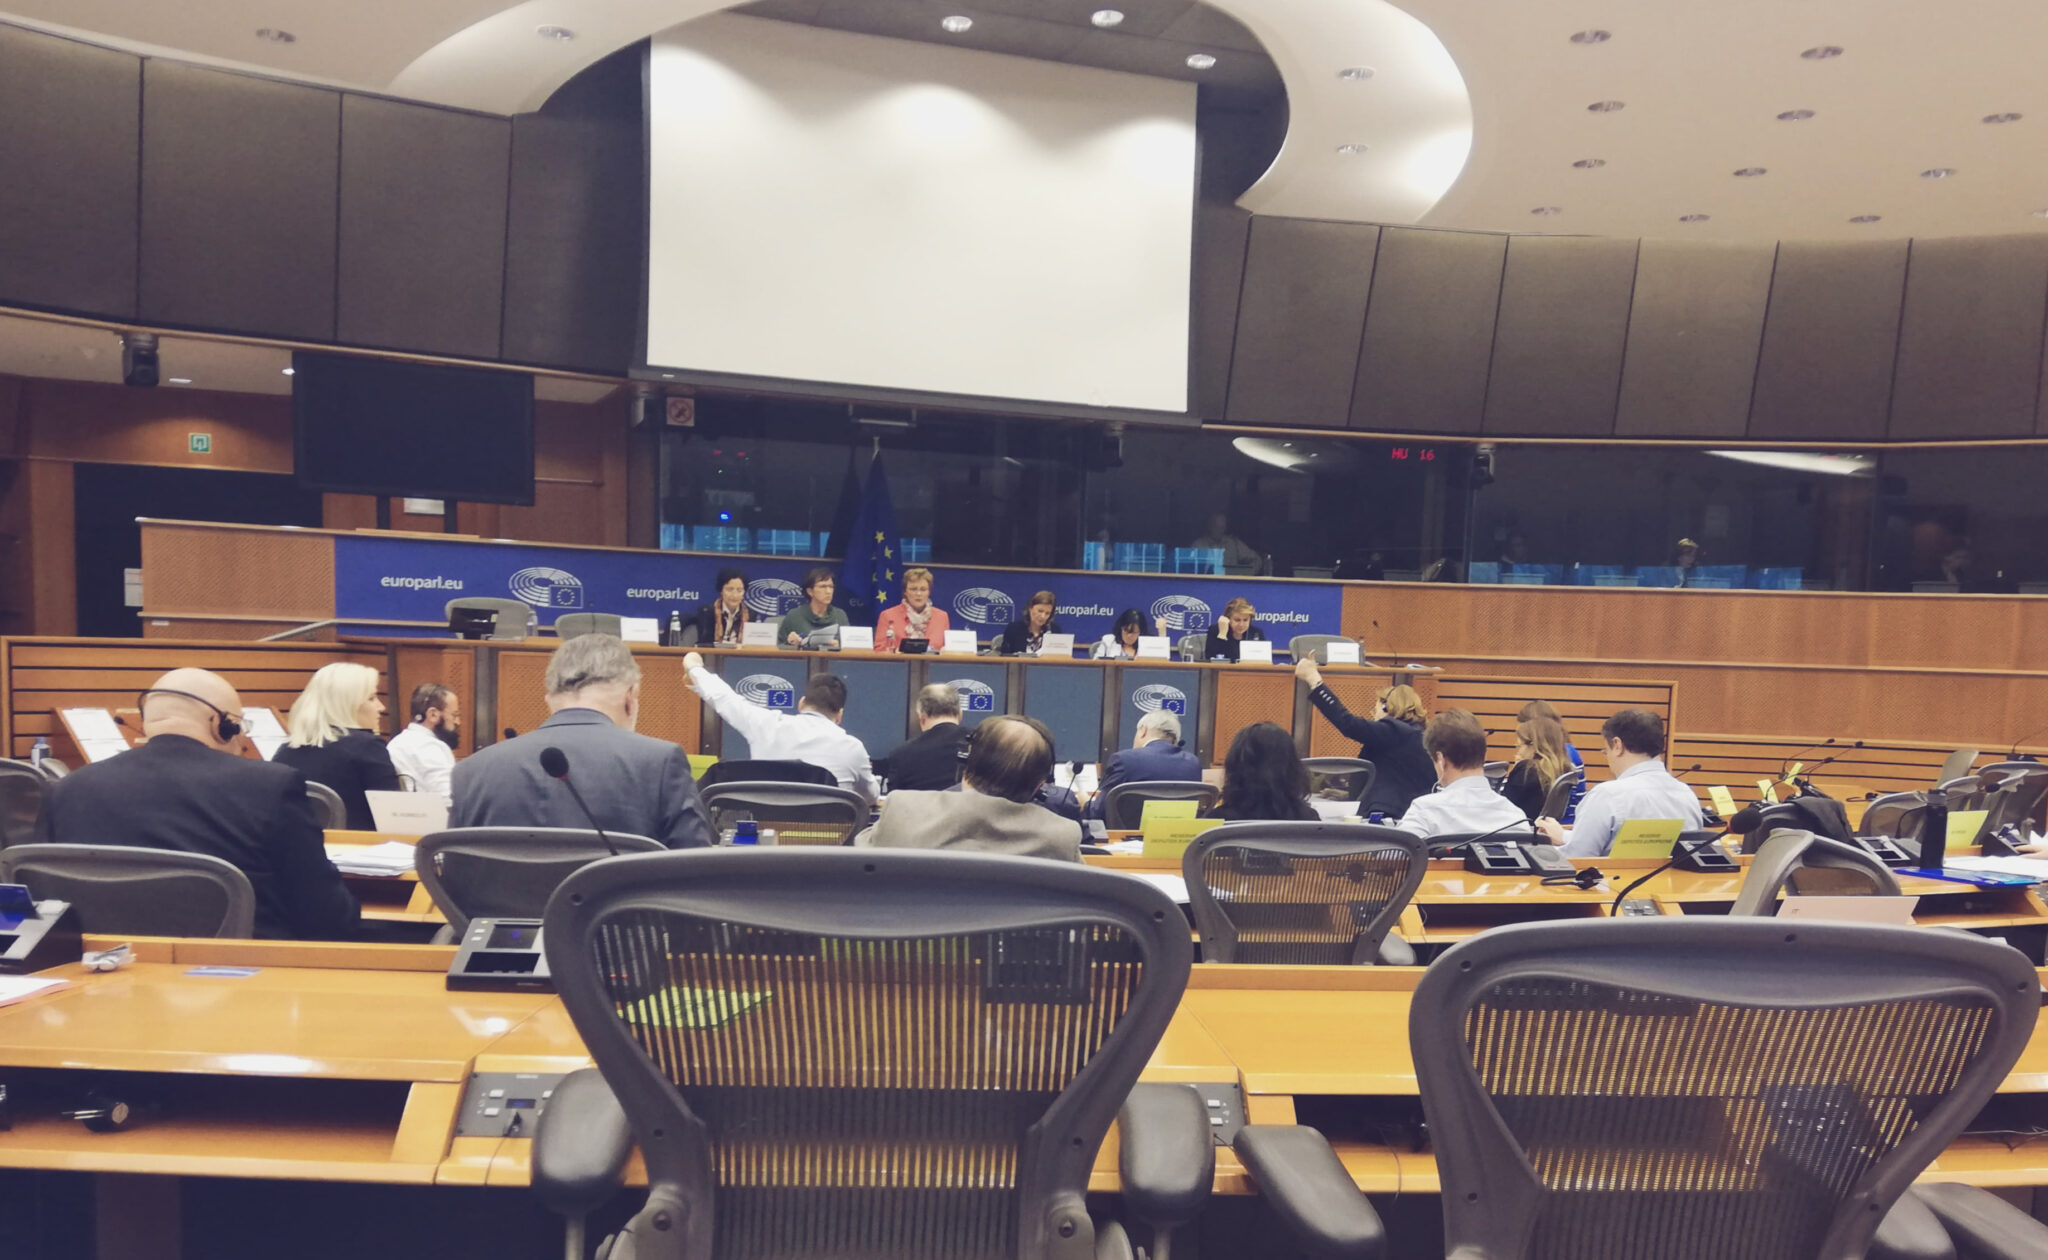 Piraterna i parlamentet om EU:s nya långtidsbudget